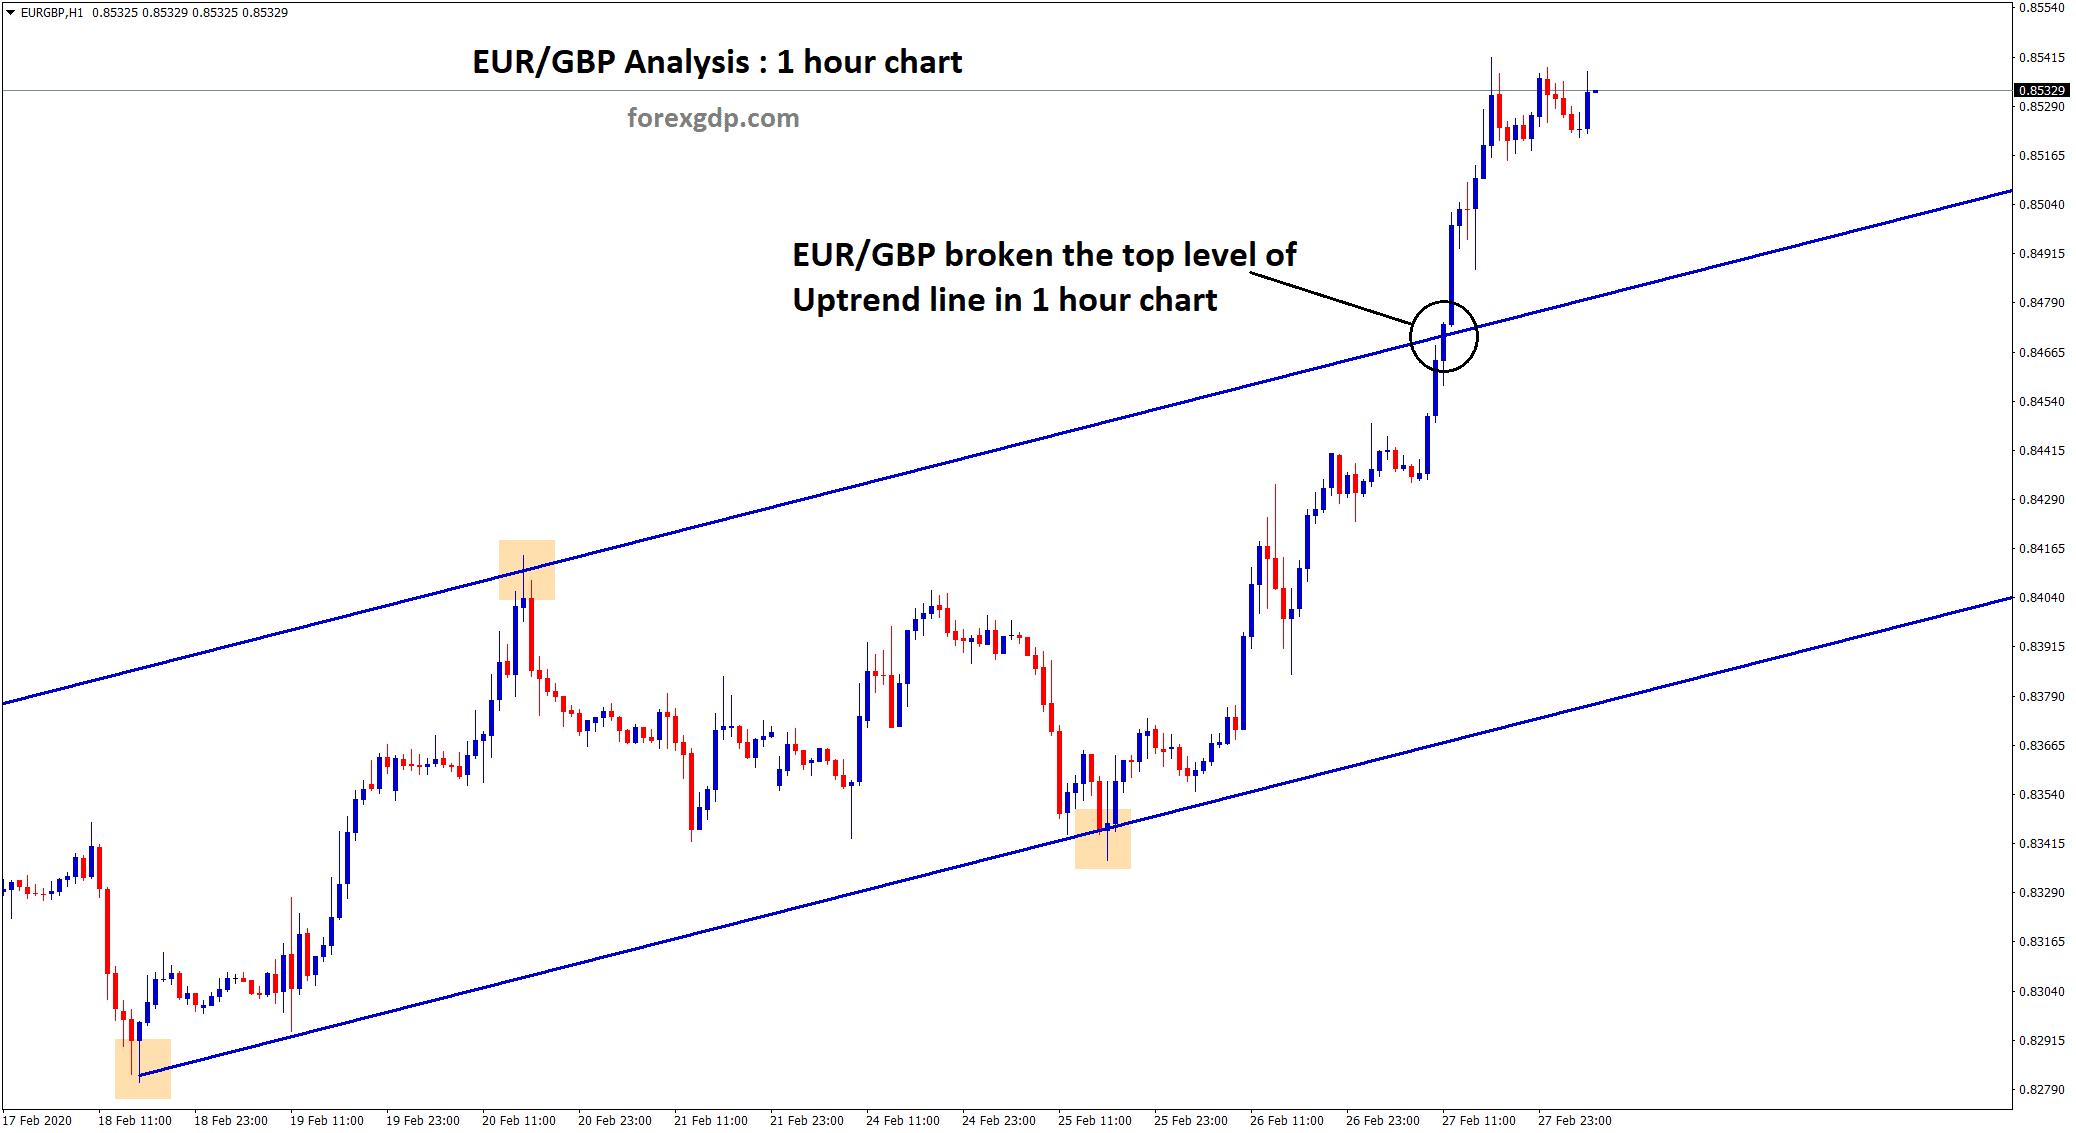 Uptrend line of EUR/GBP breakout